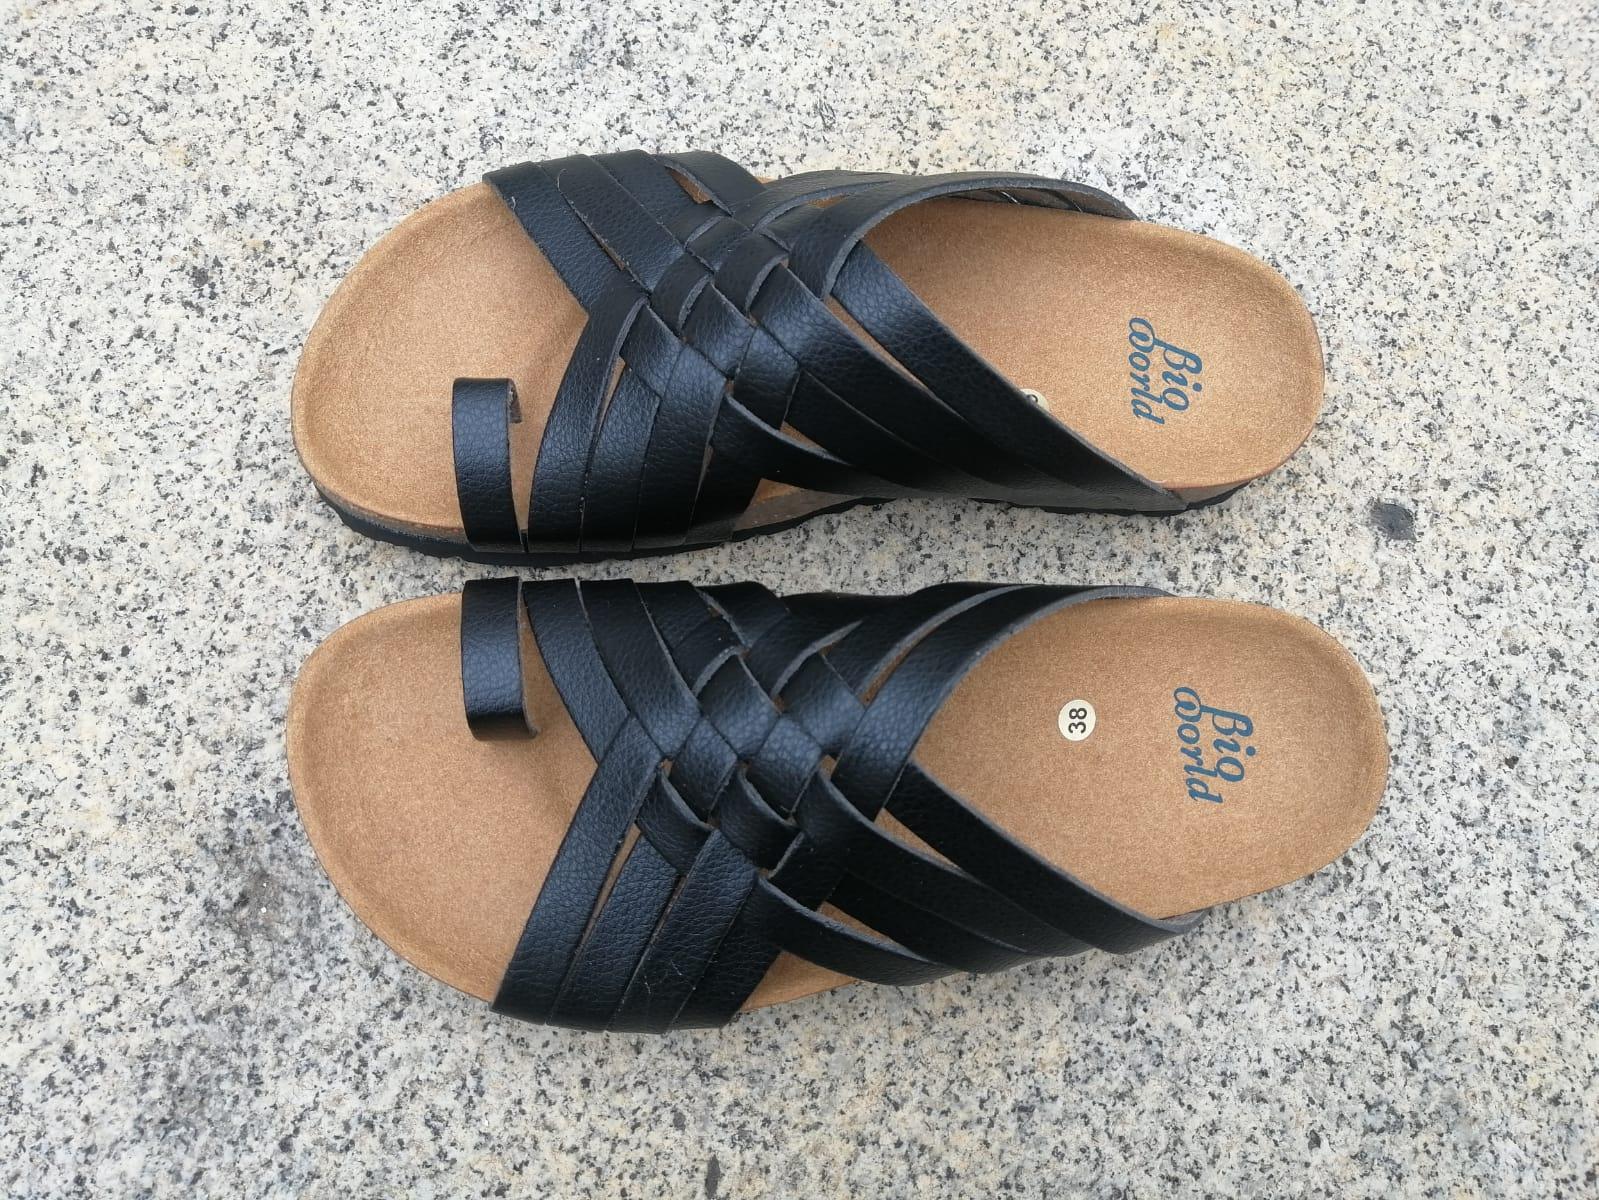 Modelo TRAJANO, Color negro sandalias veganas, sandalias veganas mujer, calzado vegano, sandalias de tacón medio, sandalias bioworld, vegan shoes